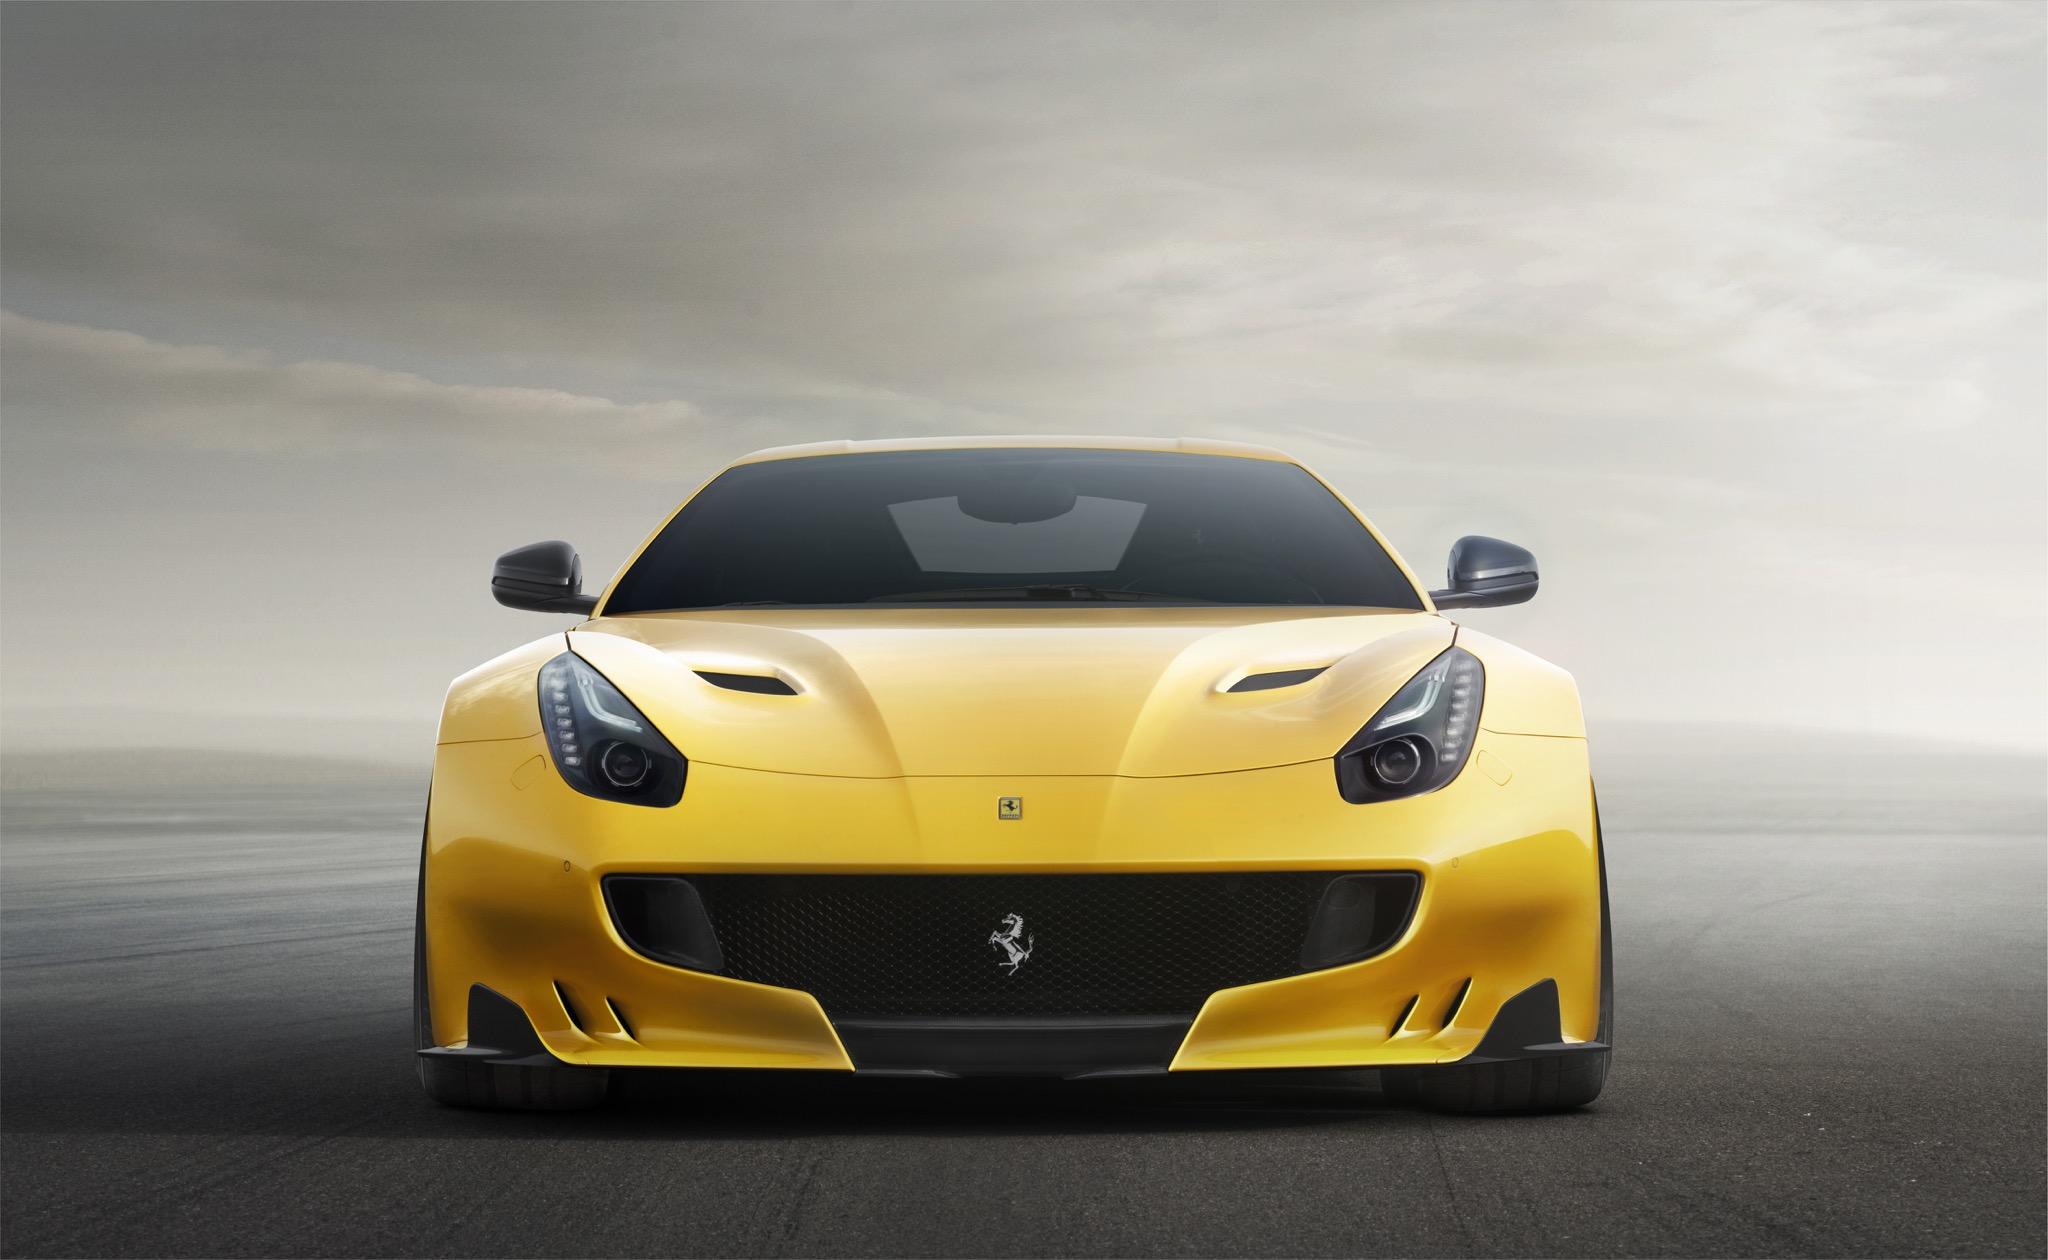 FerrariF12tdf 04